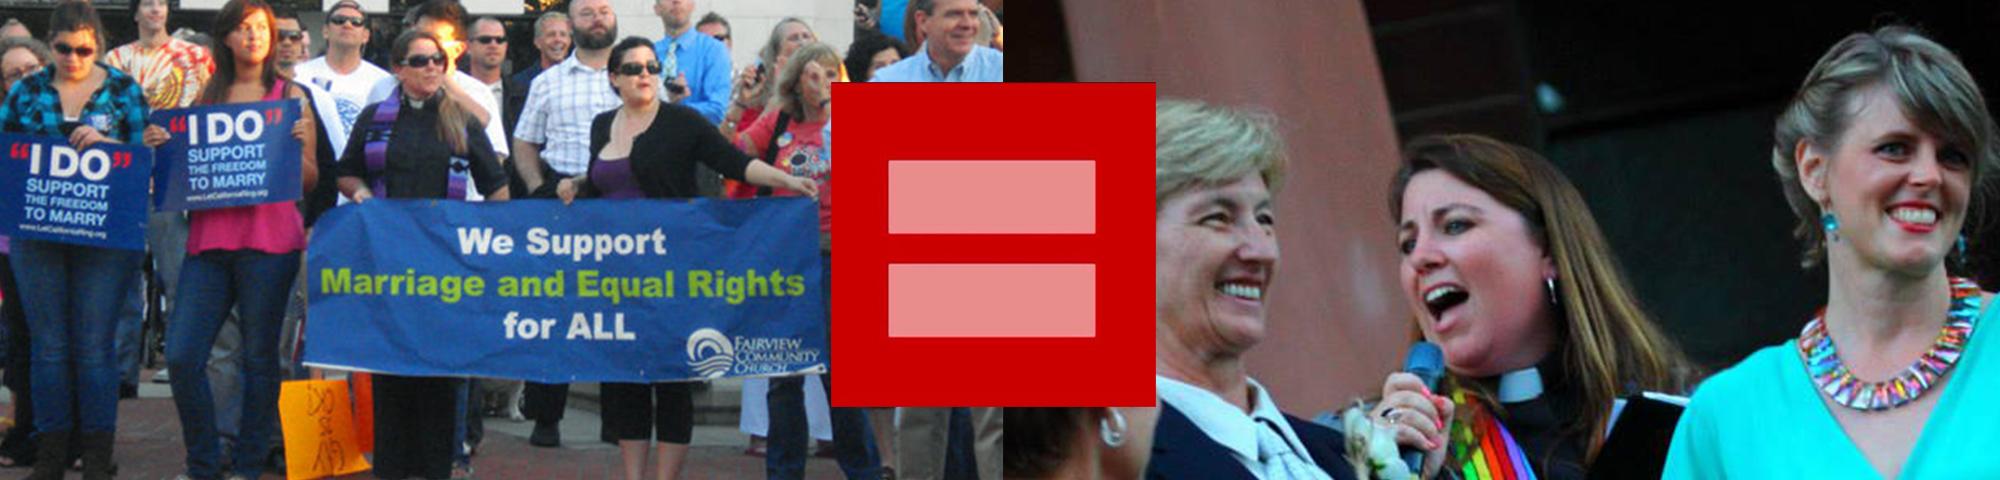 Marraige-Equality